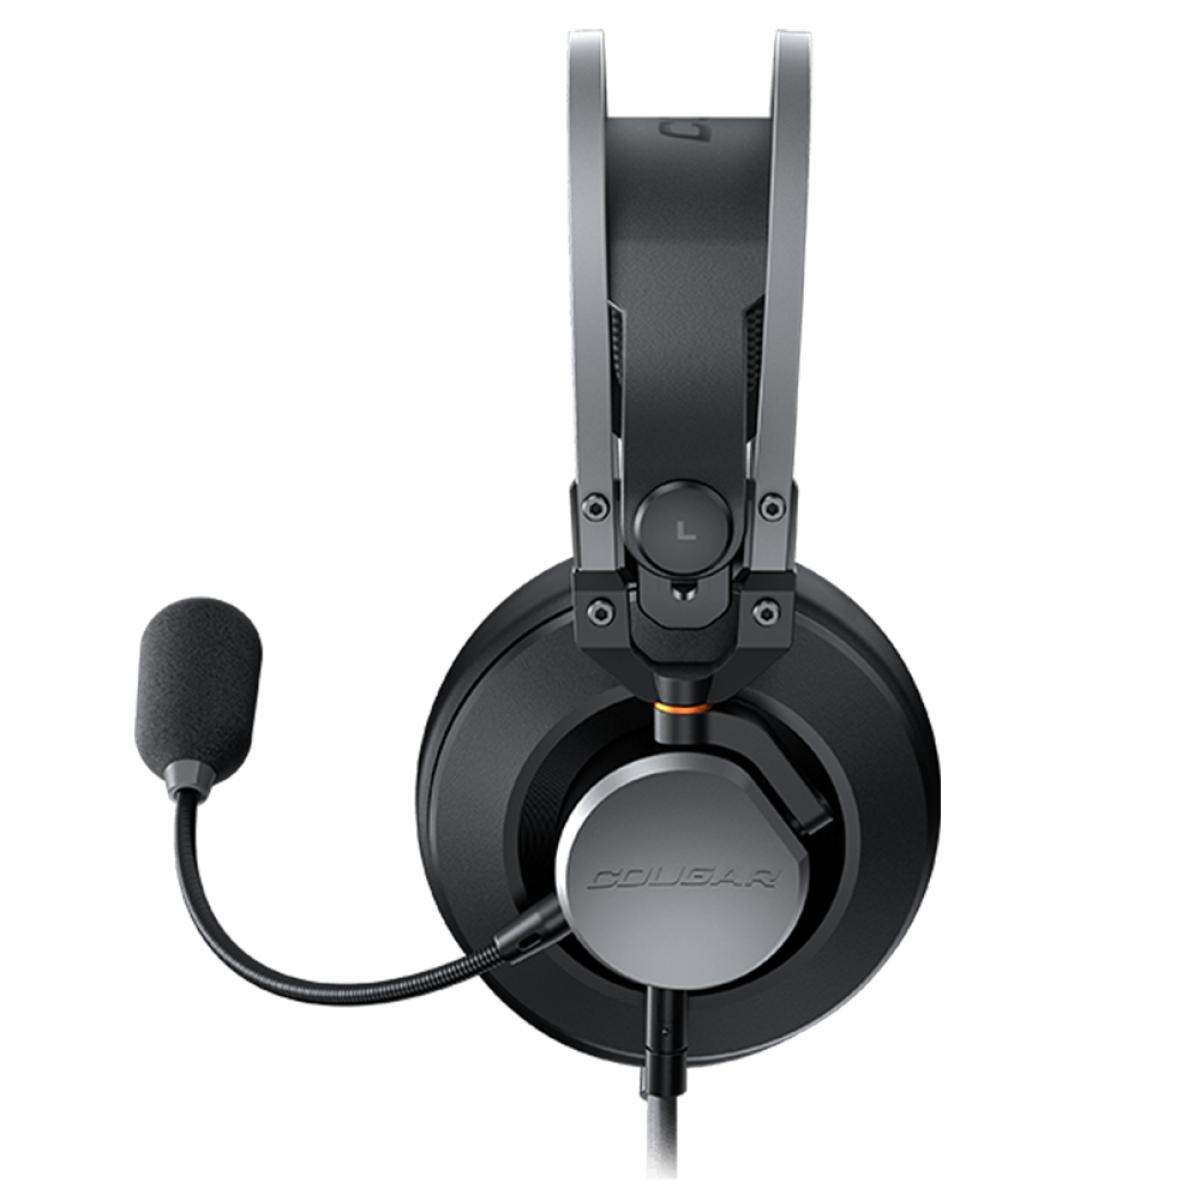 Headset Gamer Cougar VM410 Iron, 3.5mm, Multi Plataforma, Black/Gray, 3H550P53N.0001